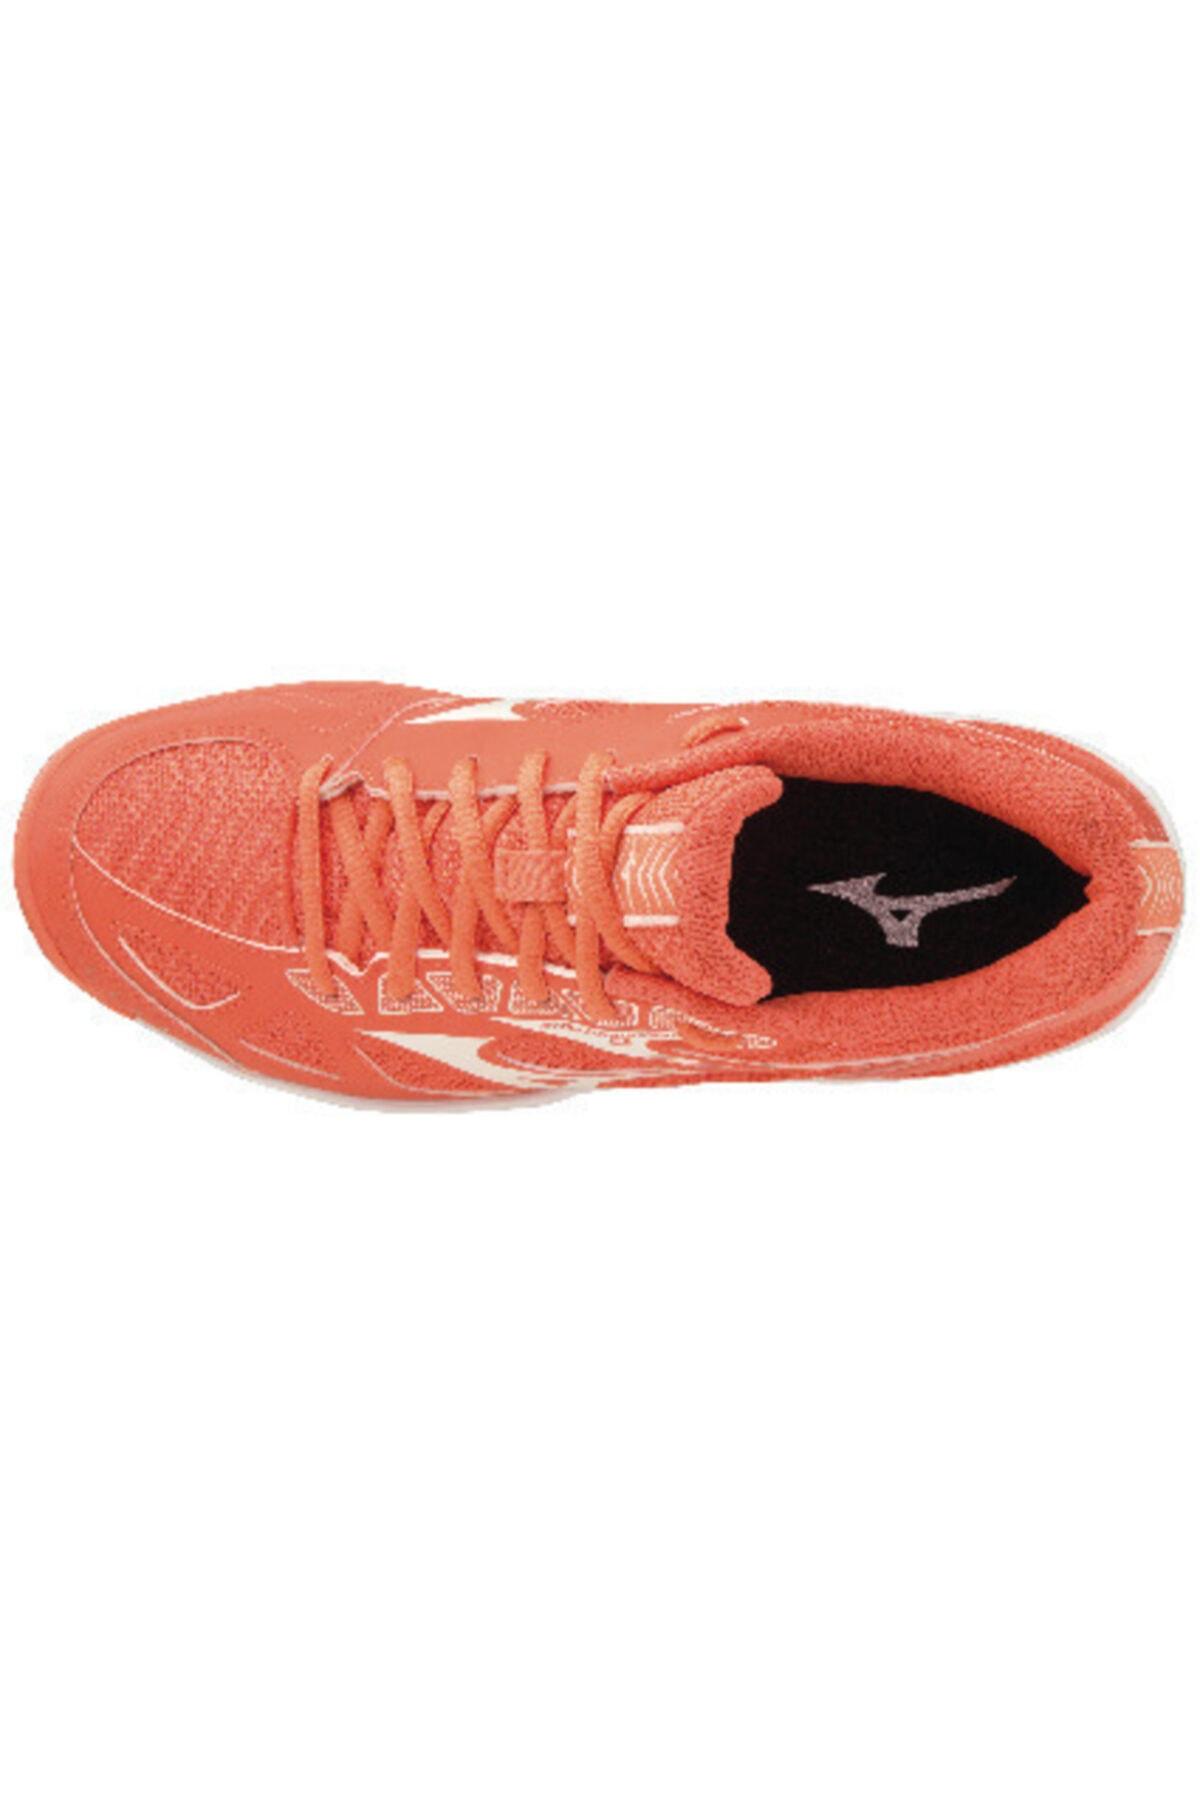 MIZUNO Cyclone Speed 2 Kadın Voleybol Ayakkabısı Pembe 2